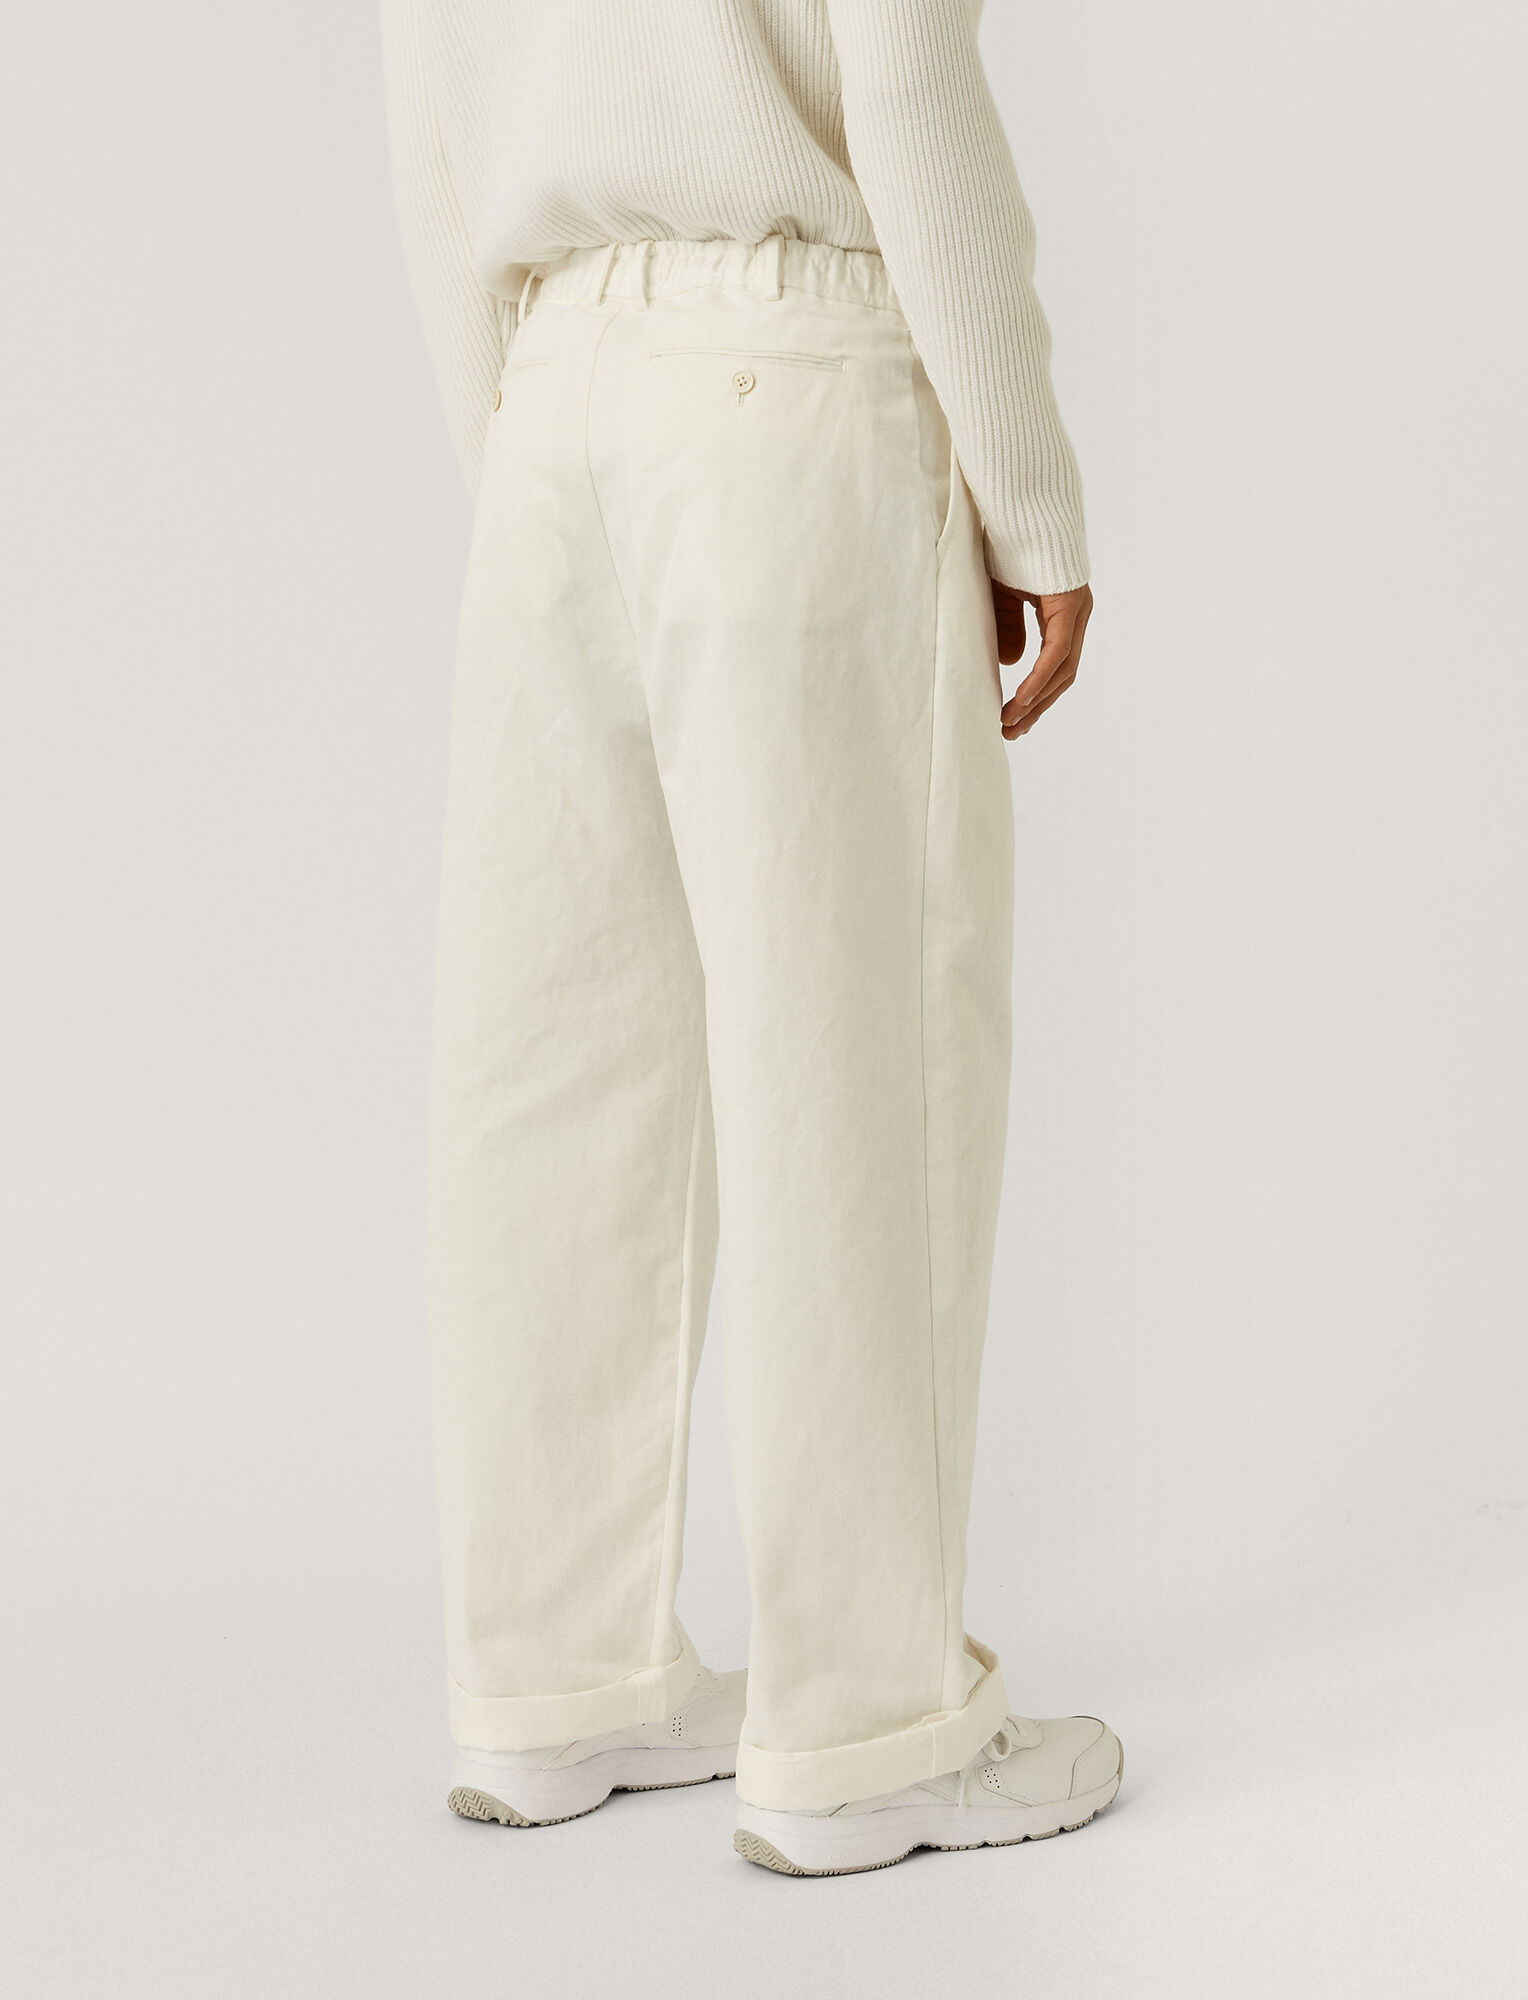 Joseph, Cotton Linen Gabardine Wave Trousers, in WHITE